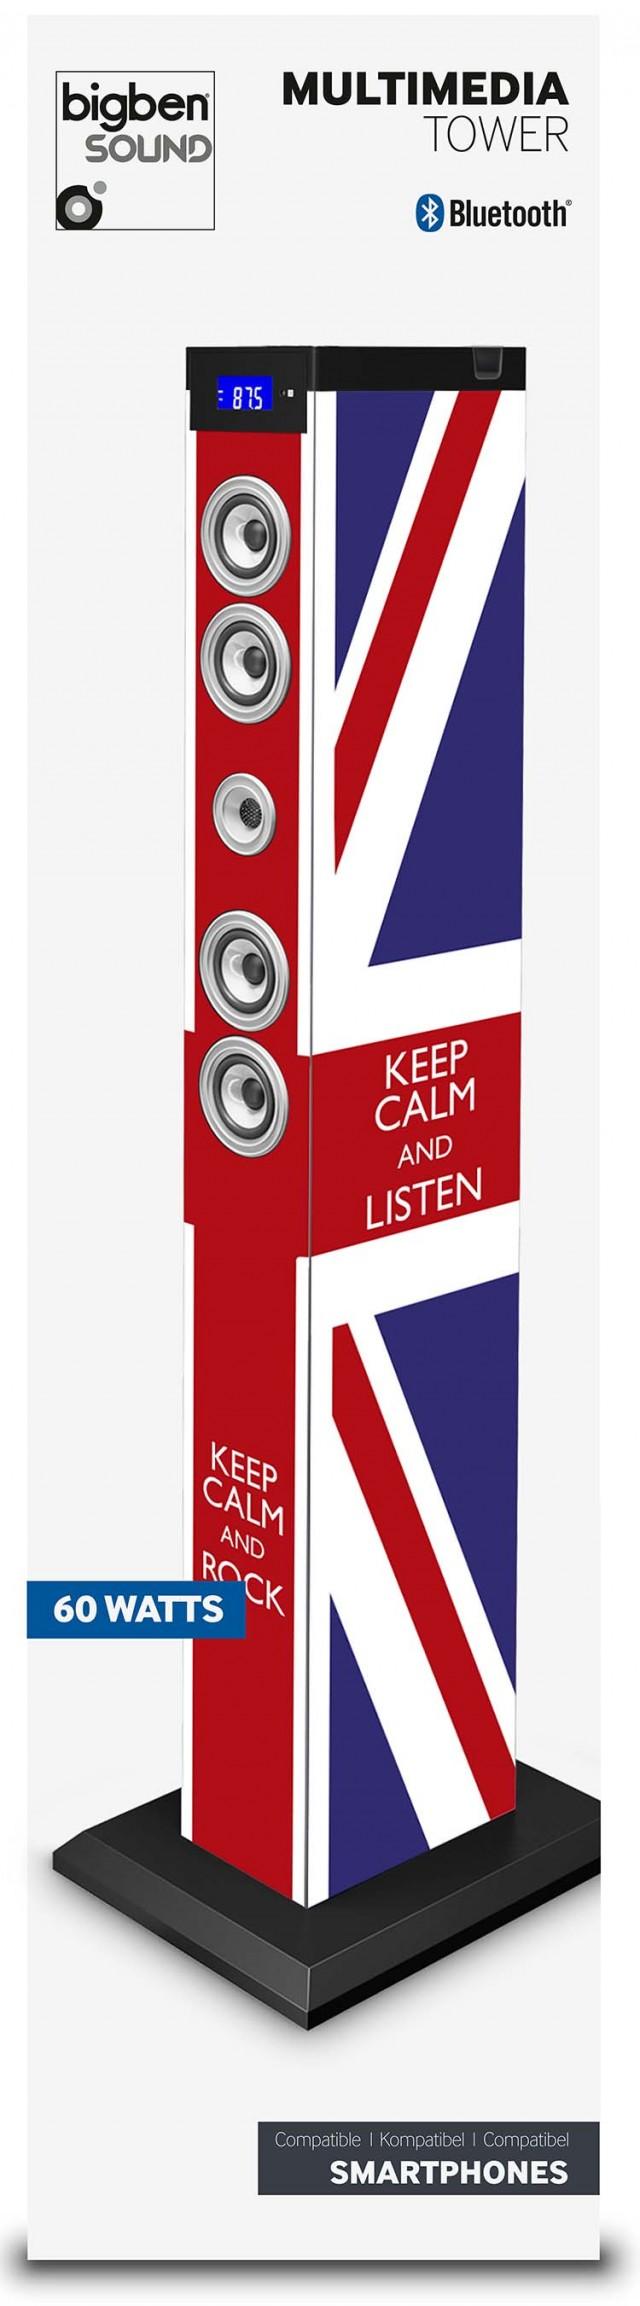 Multimedia Tower Keep Calm (UK) – Immagine #2